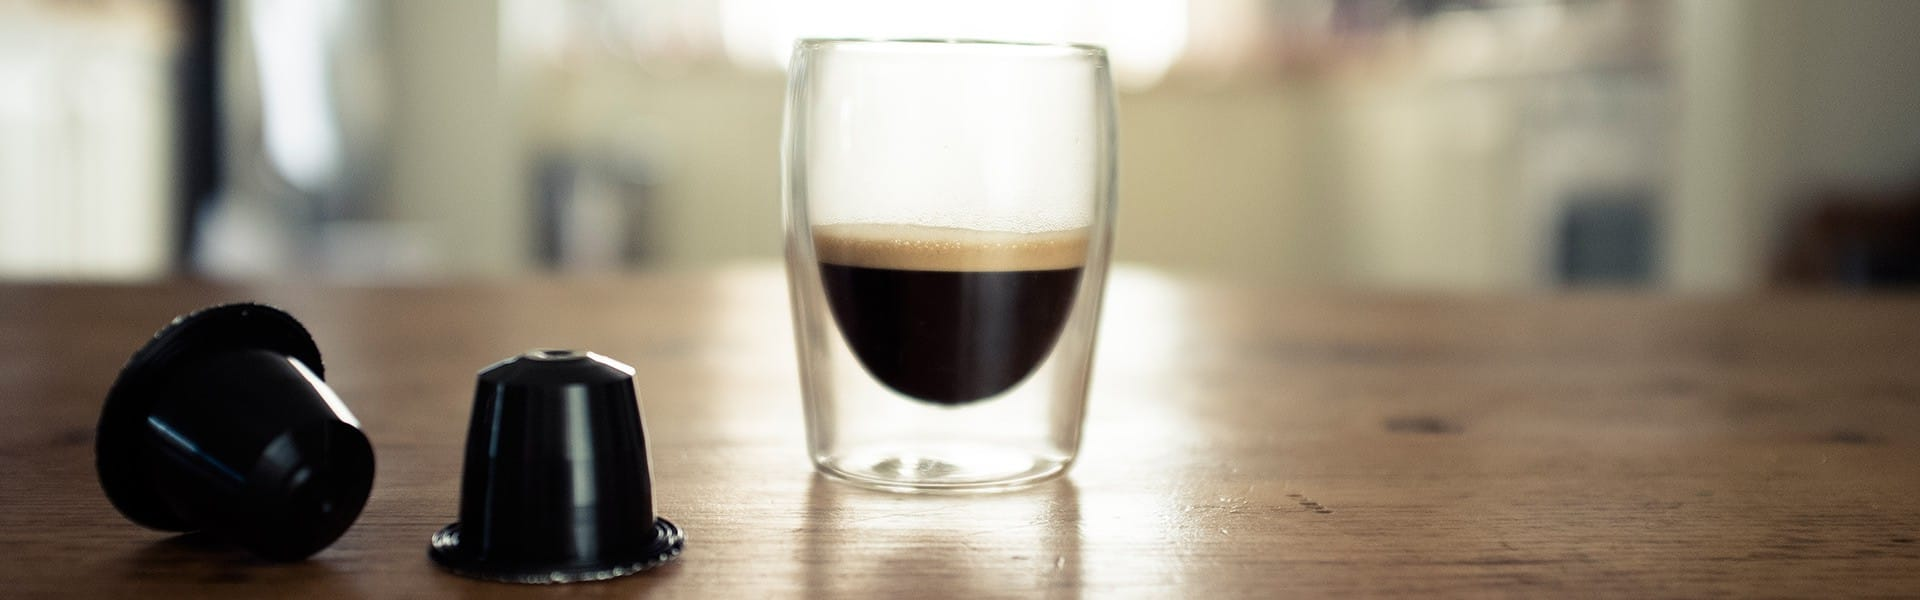 nespresso-compatible-coffee-capsules-noir